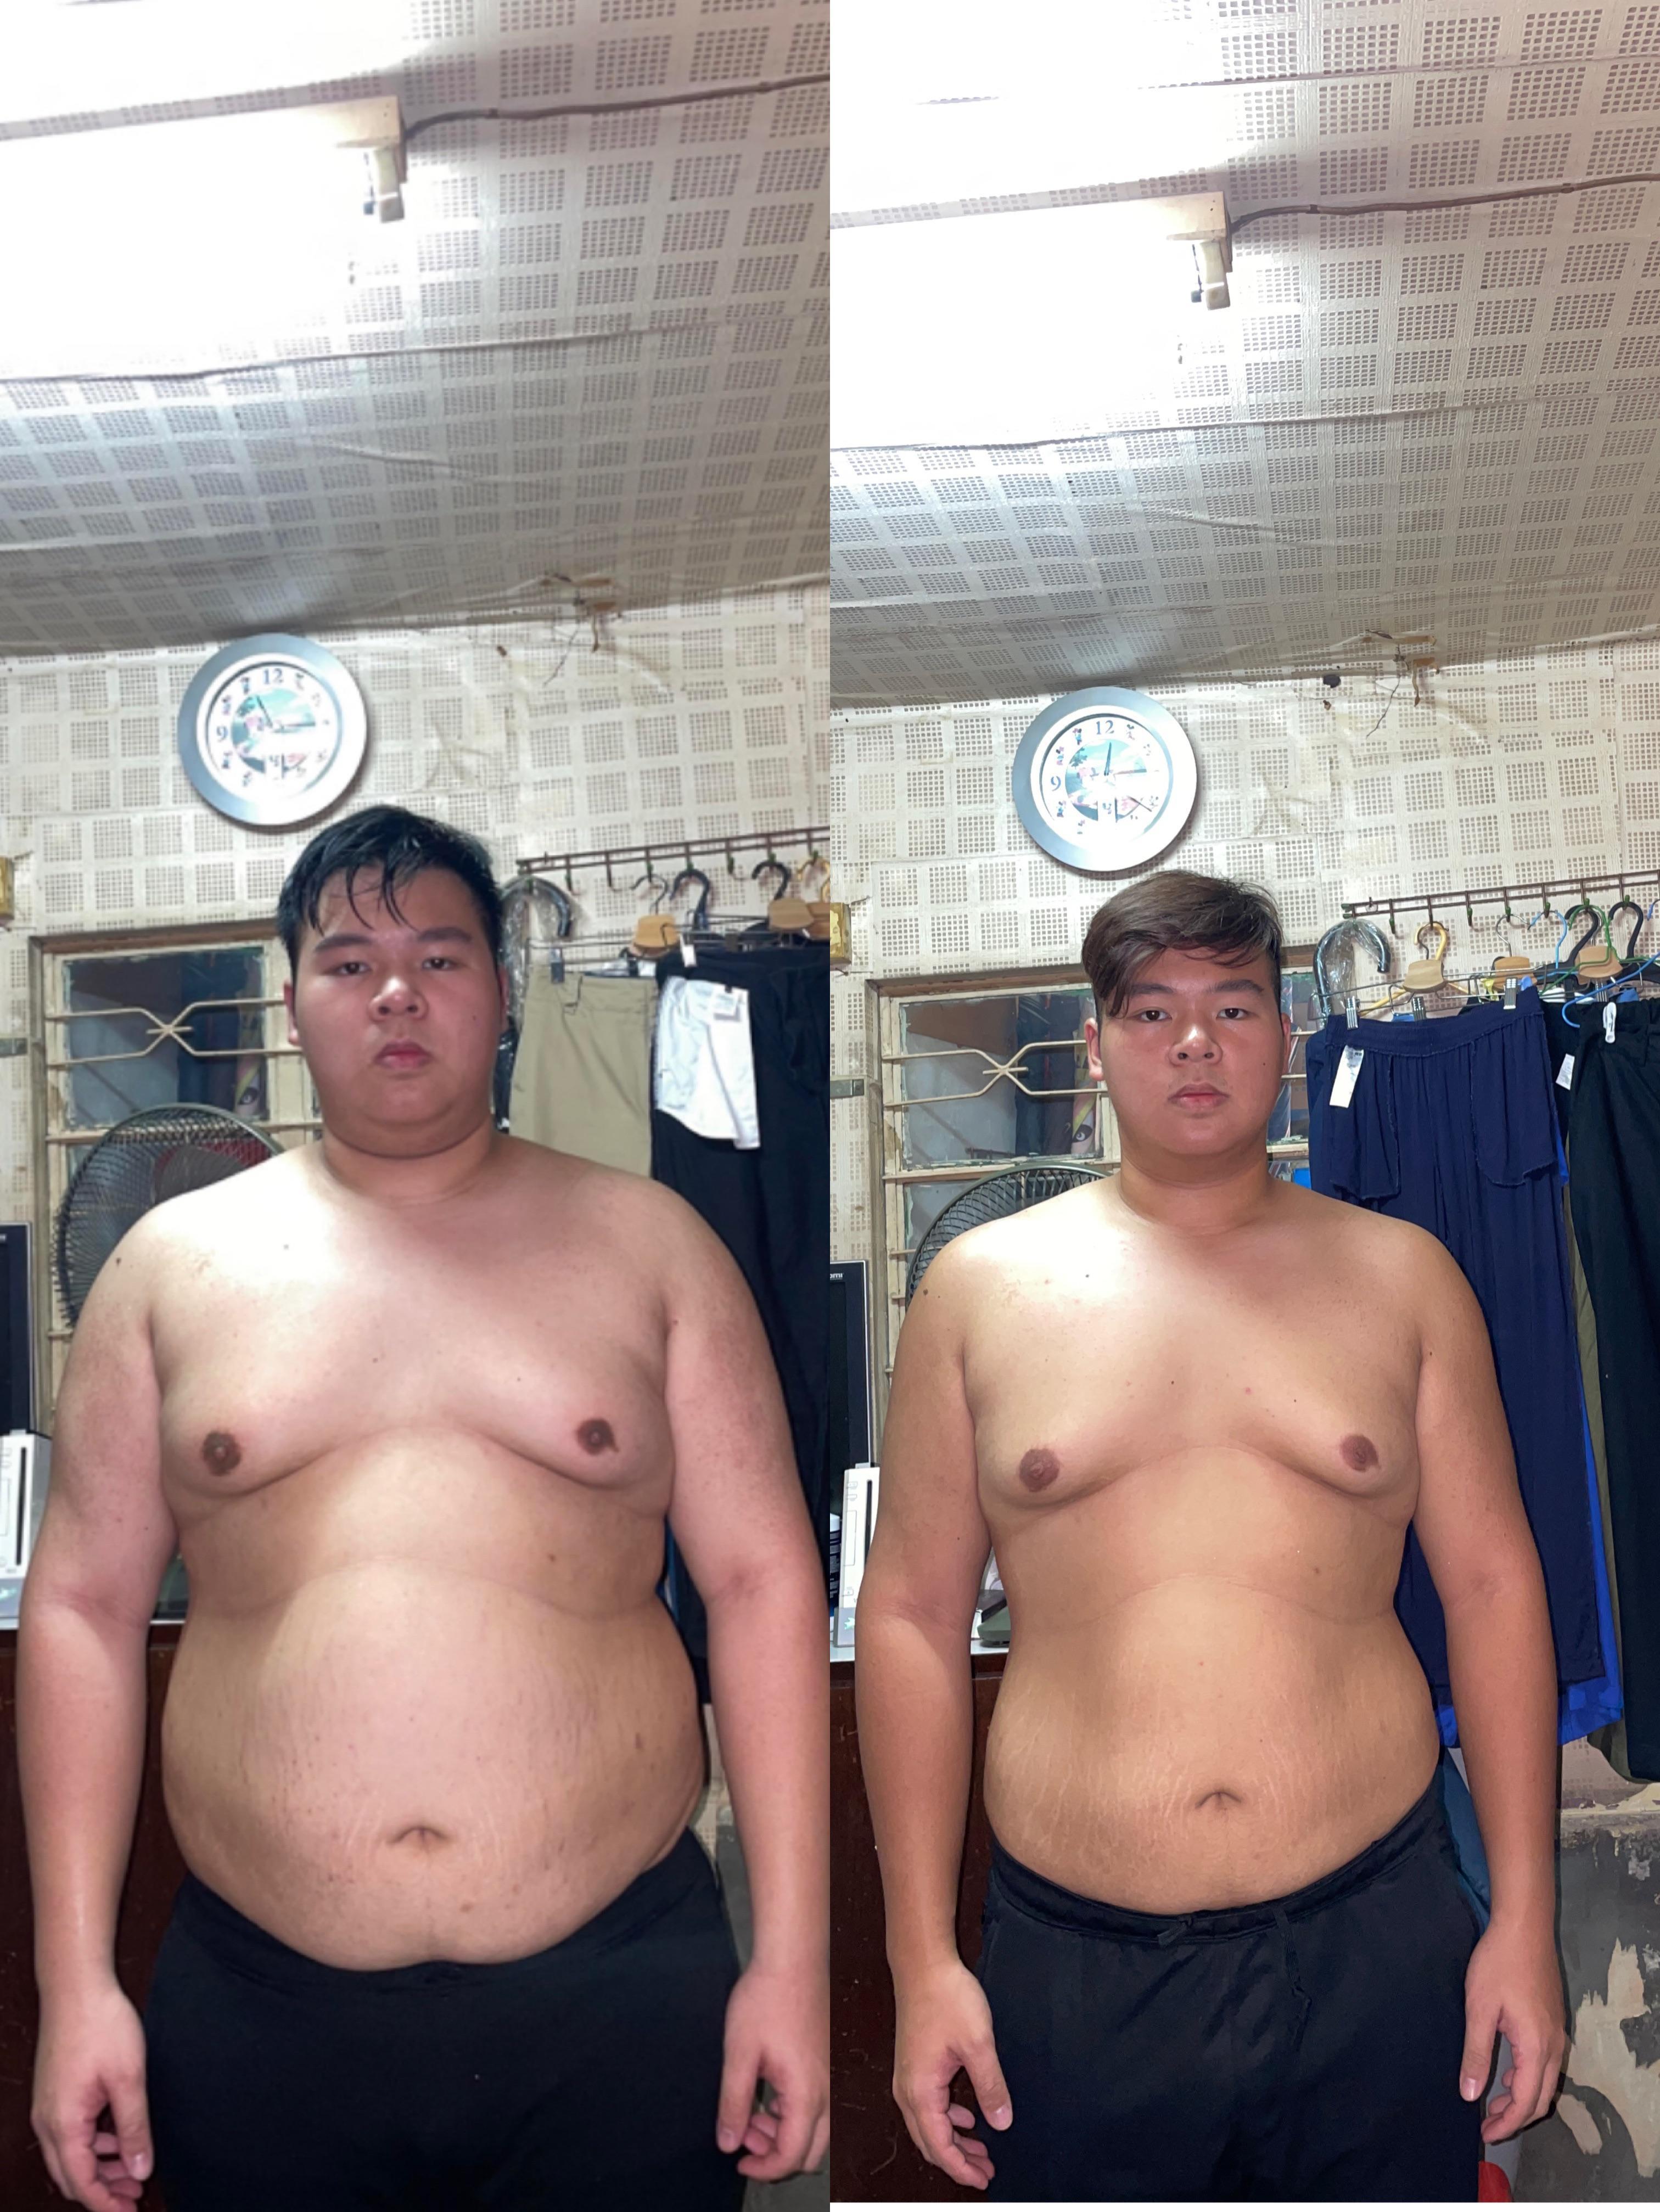 5 foot 11 Male 50 lbs Fat Loss 278 lbs to 228 lbs